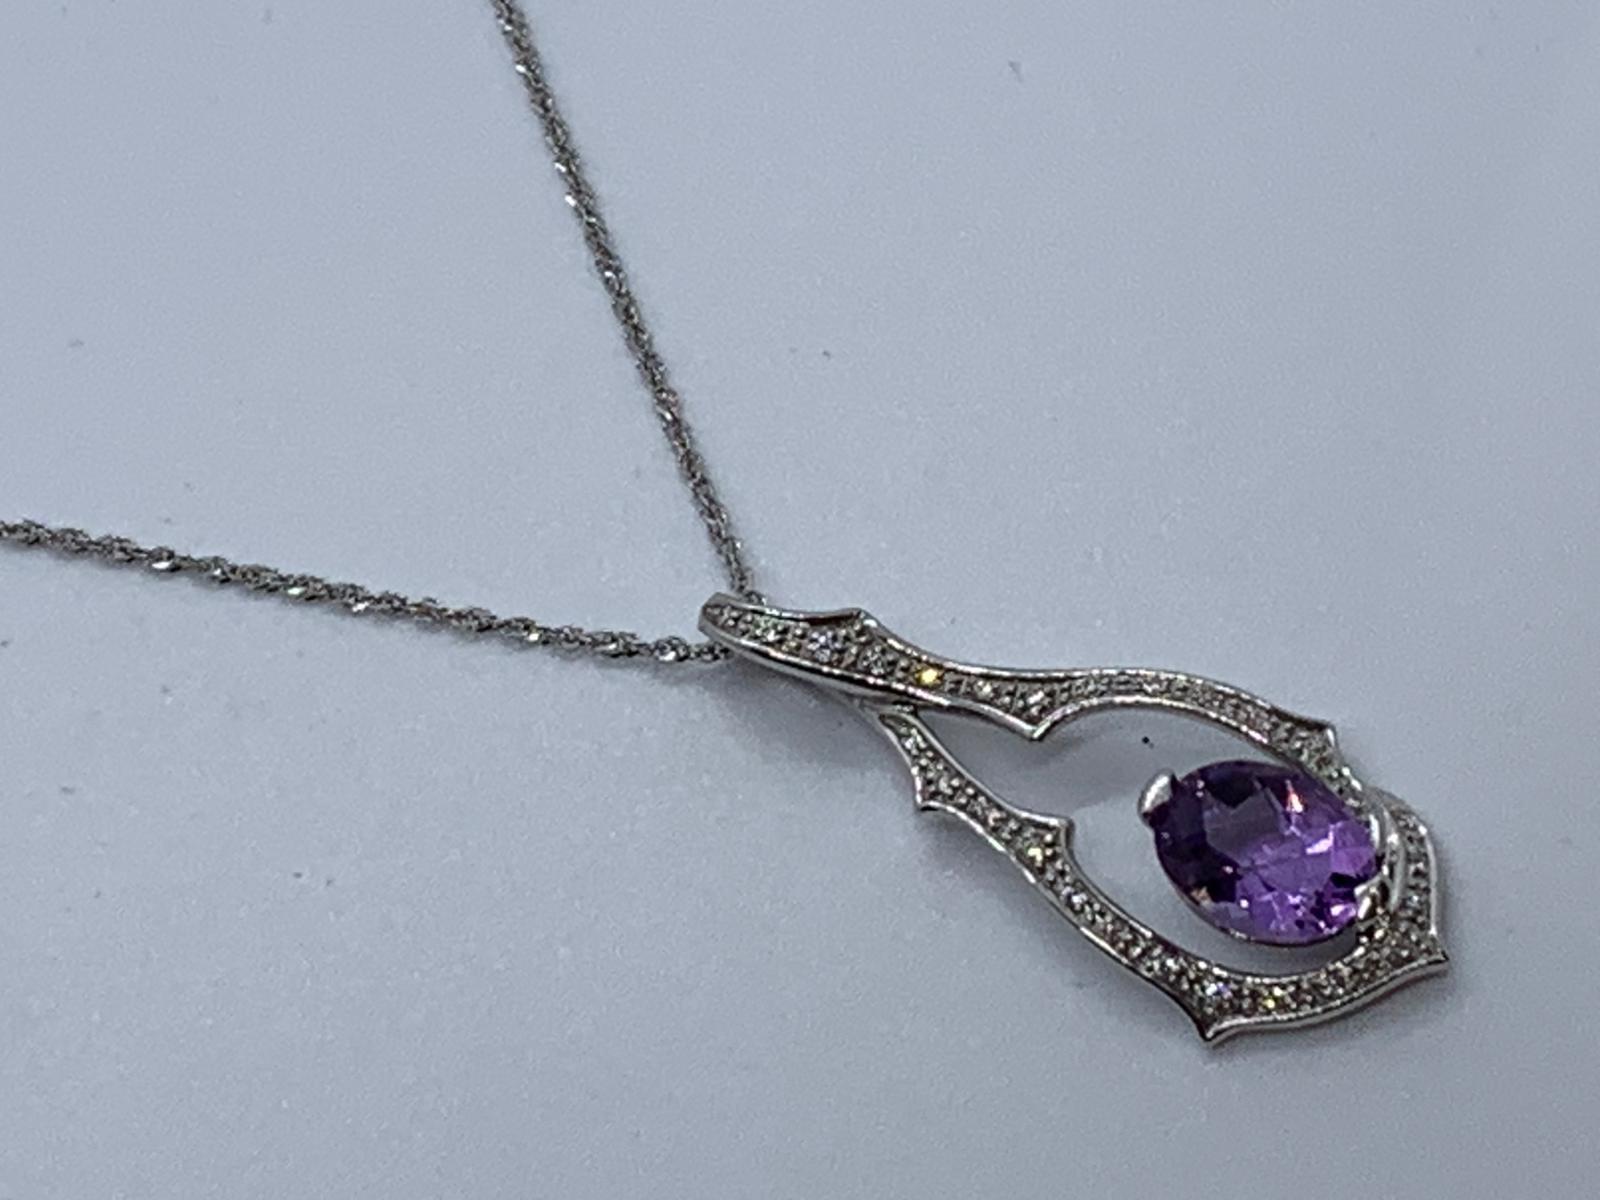 Lot 20 - 9ct white gold amethyst & diamond pendant & chain